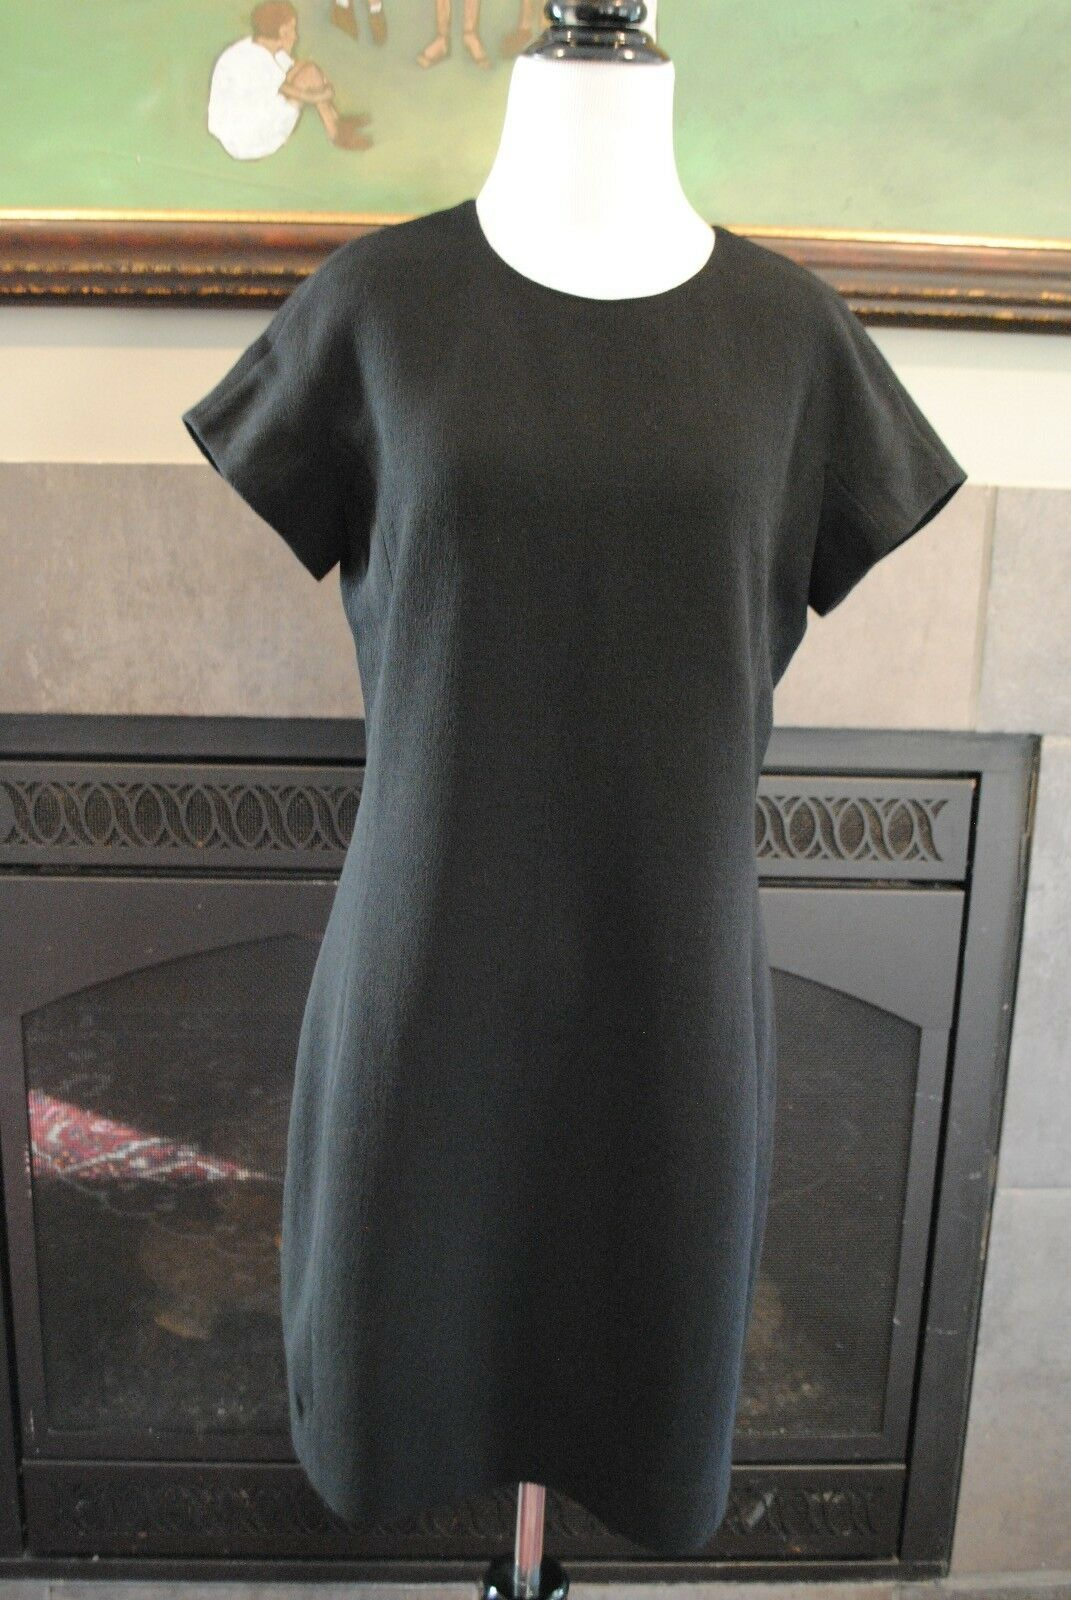 NWT J Crew Double Faced Wool Crepe Dress 10 Medium M 02805  schwarz